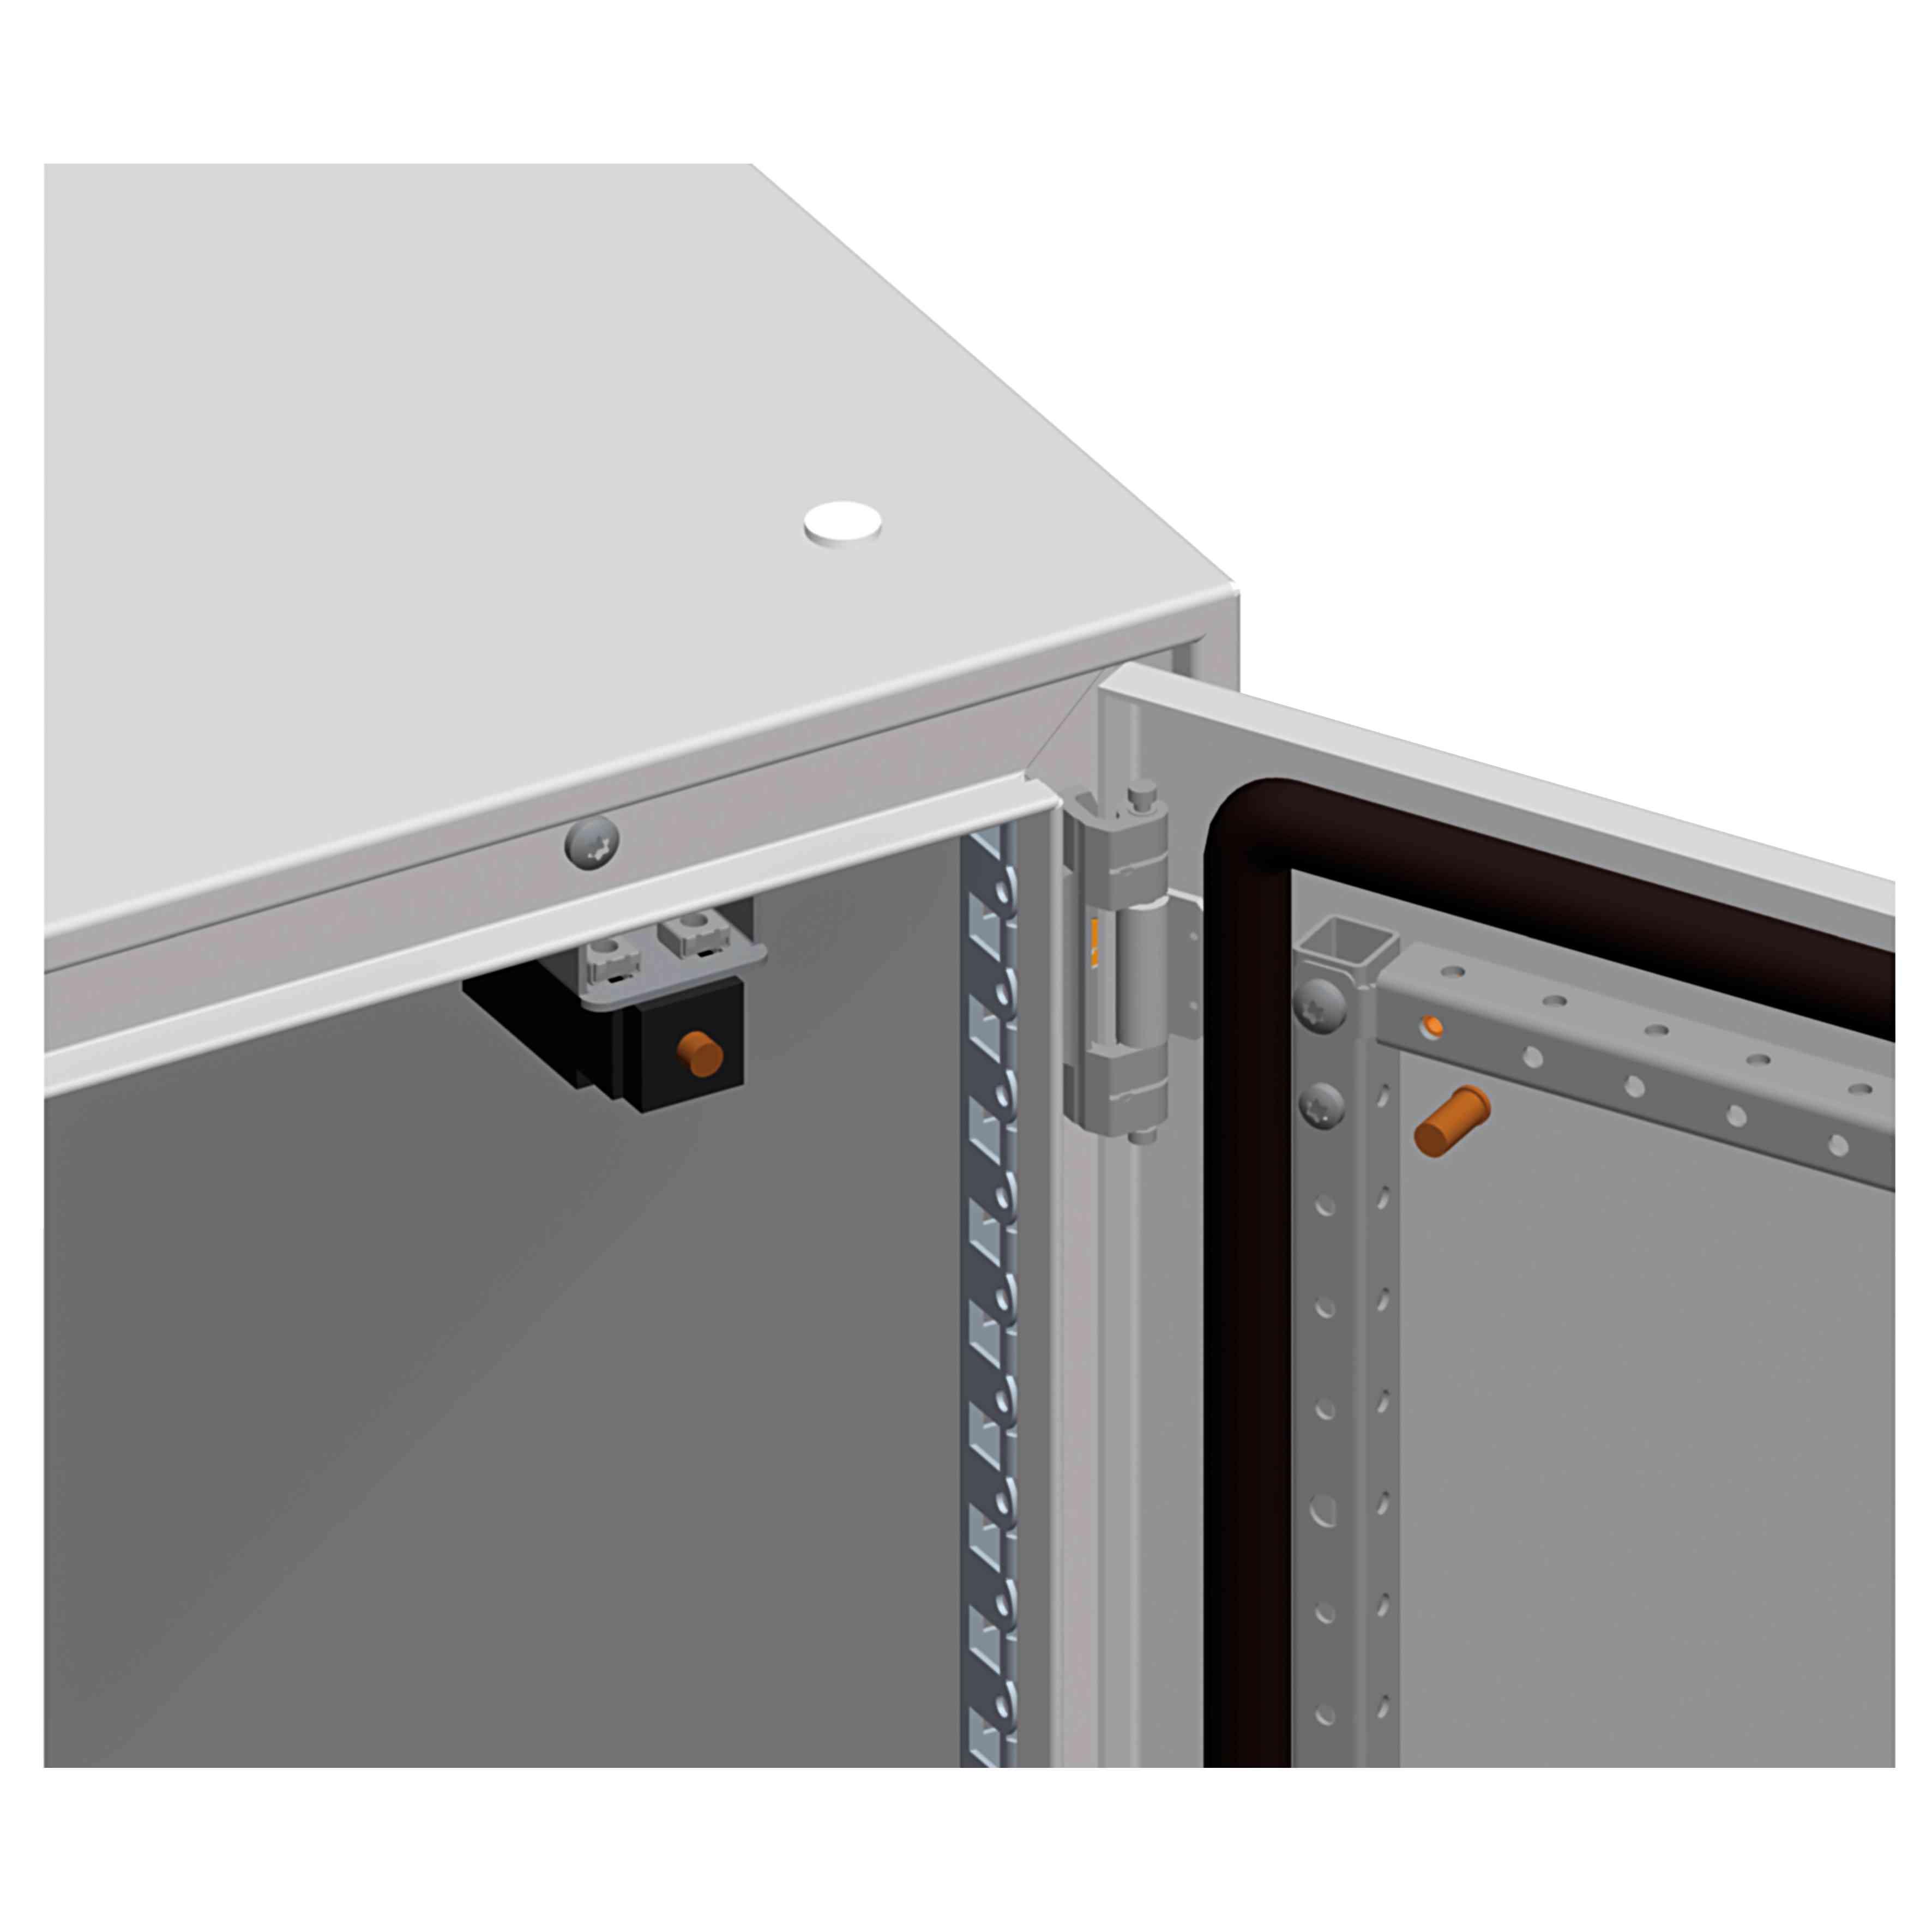 Stikalo vrat Spacial SM 10 A/500 V - priključek M20